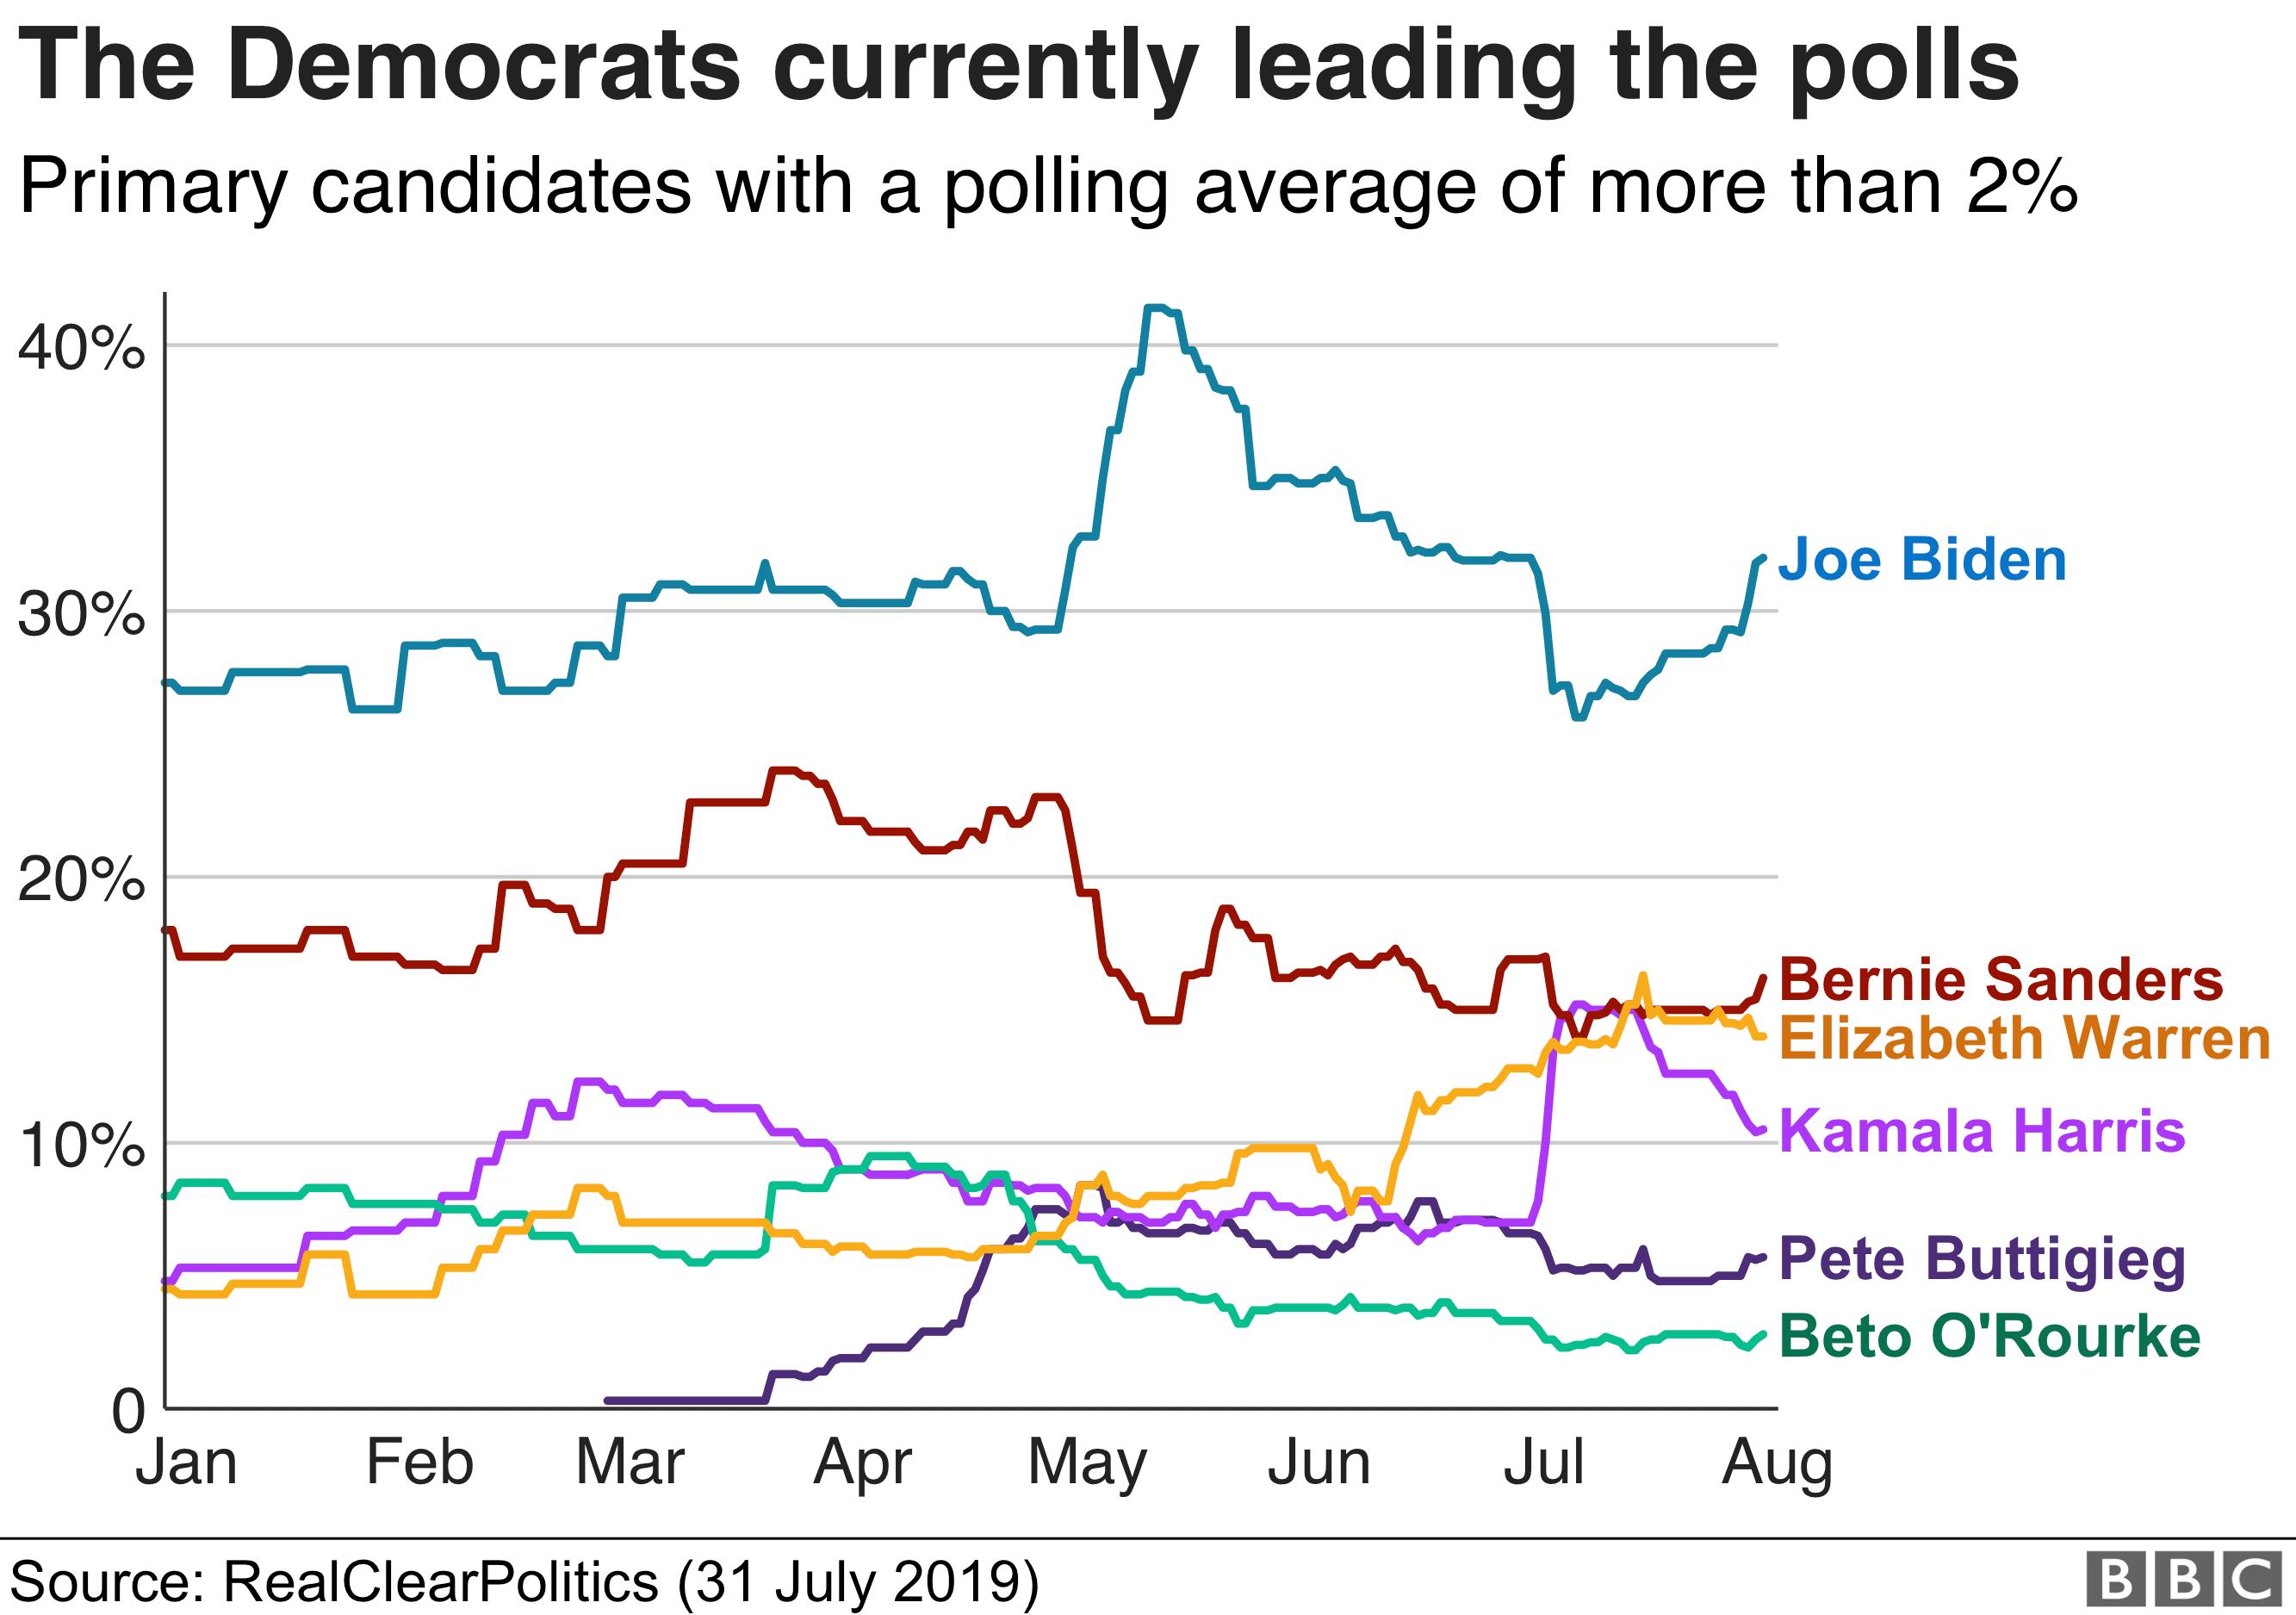 Chart showing the top six polling Democratic candidates as of 31 July 2019. Latest polling figures: Joe Biden 32%; Bernie Sanders 16%; Elizabeth Warren 14%; Kamala Harris 10%; Pete Buttigieg 6%; Beto O'Rourke 3%.